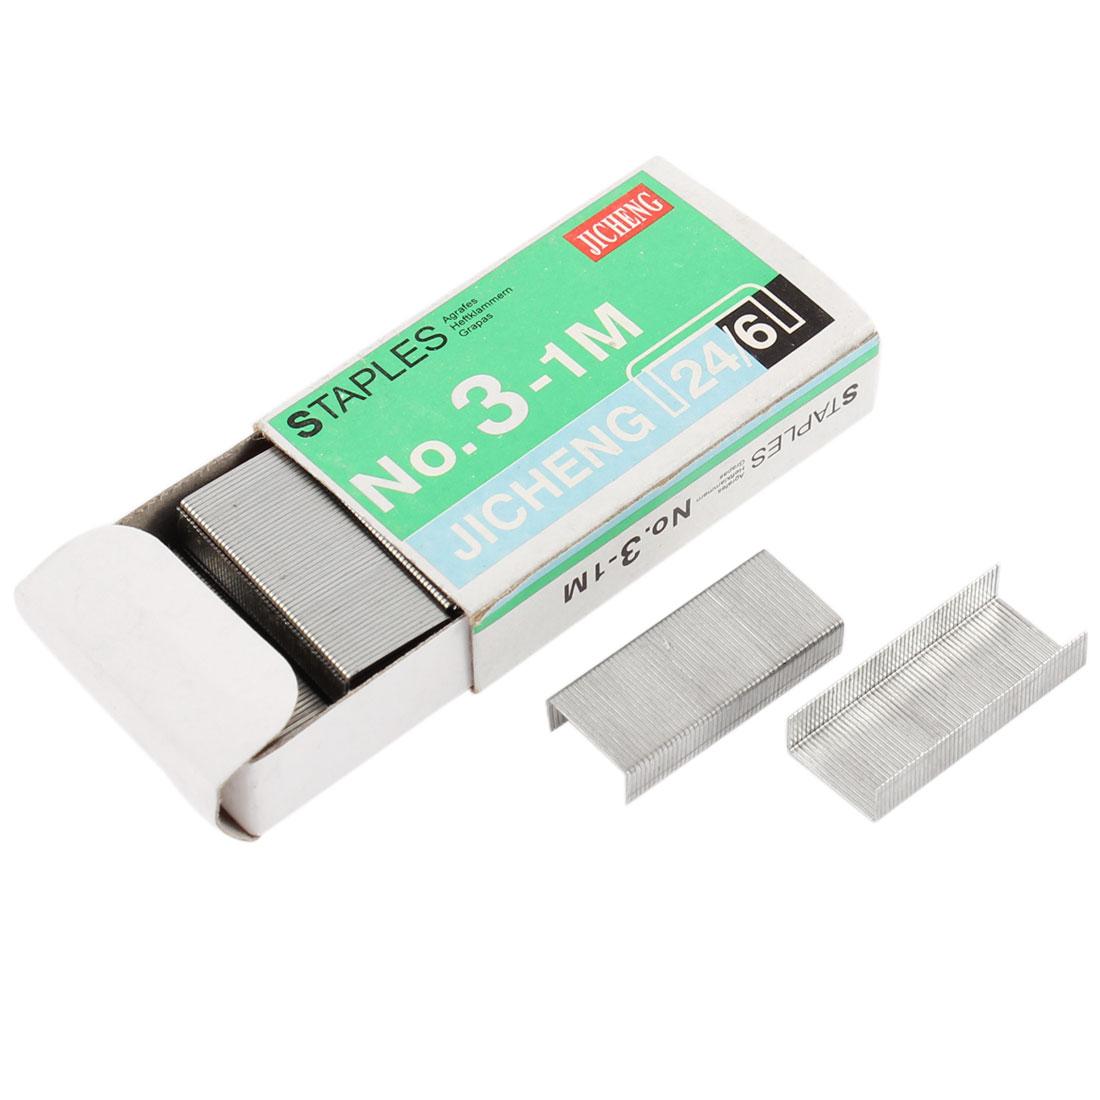 800 Pcs Metal Paper Staples Document Binding Fastener for Office School